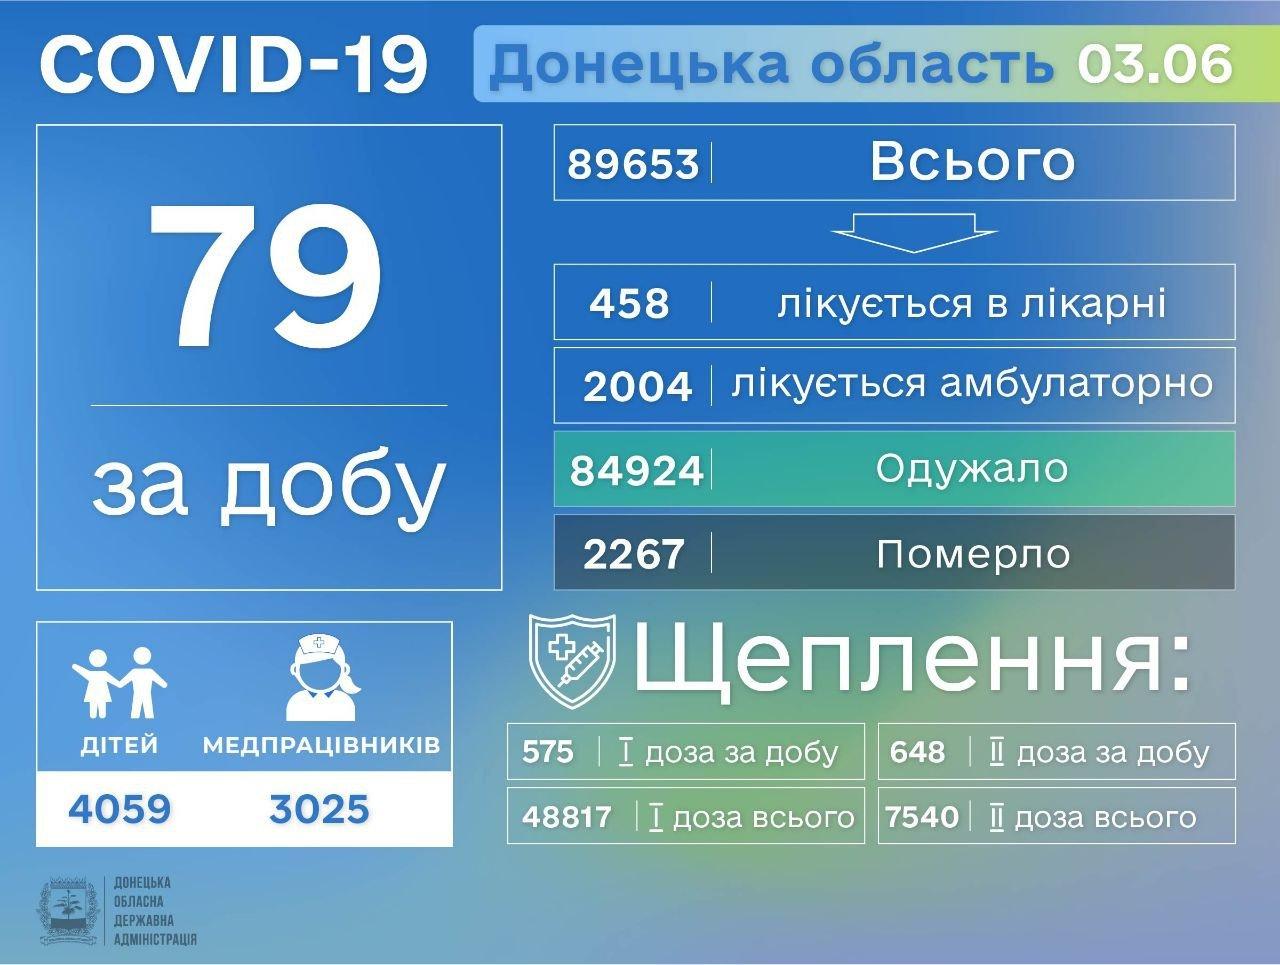 В Донецкой области 79 заболевших COVID-19, фото-1